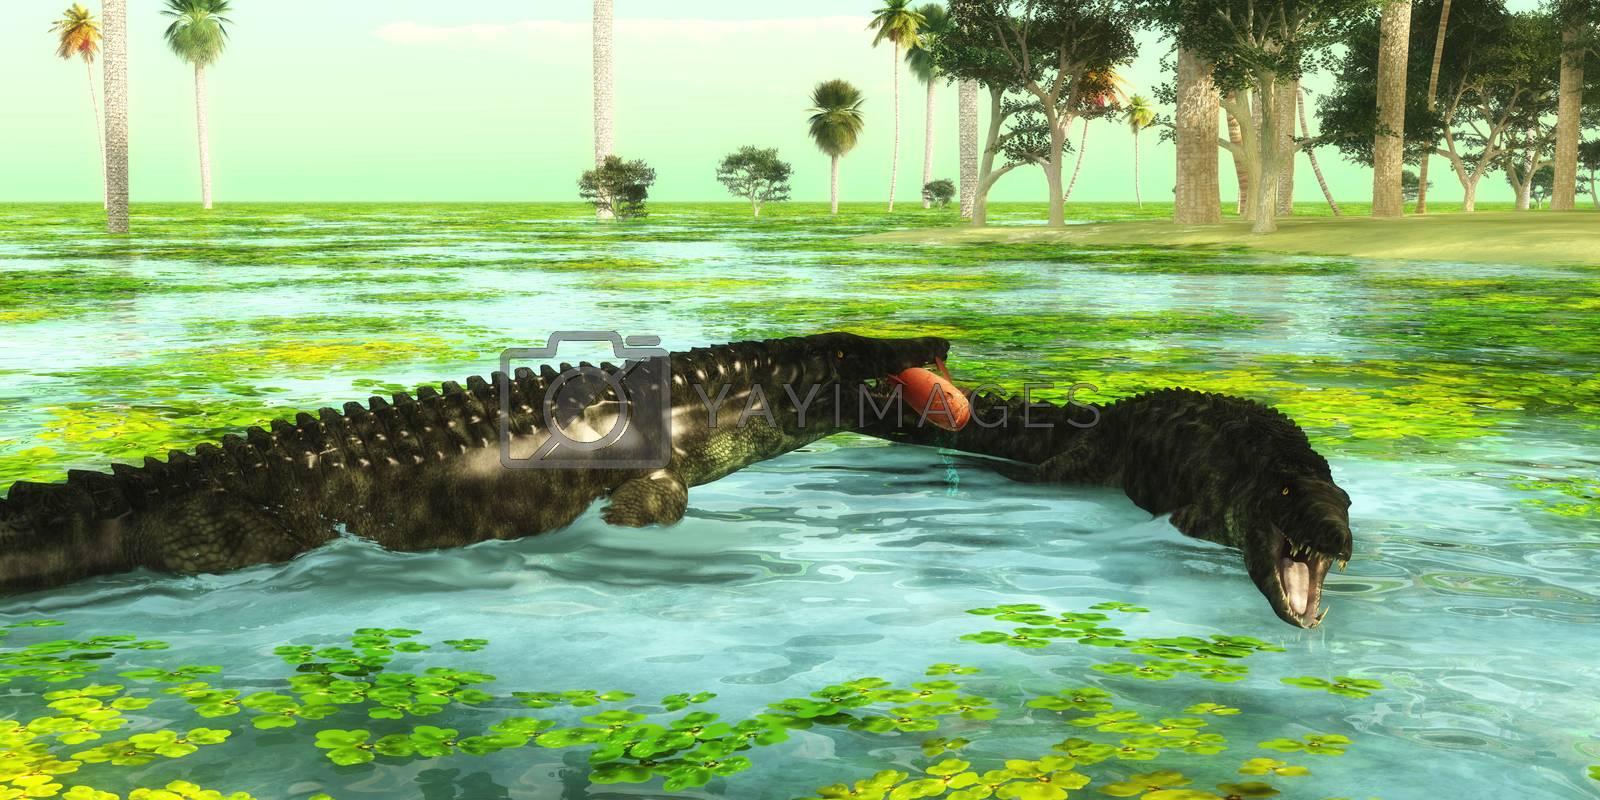 Uberabasuchus reptiles catch fish in a tropical region of Brazil in the Cretaceous Period.